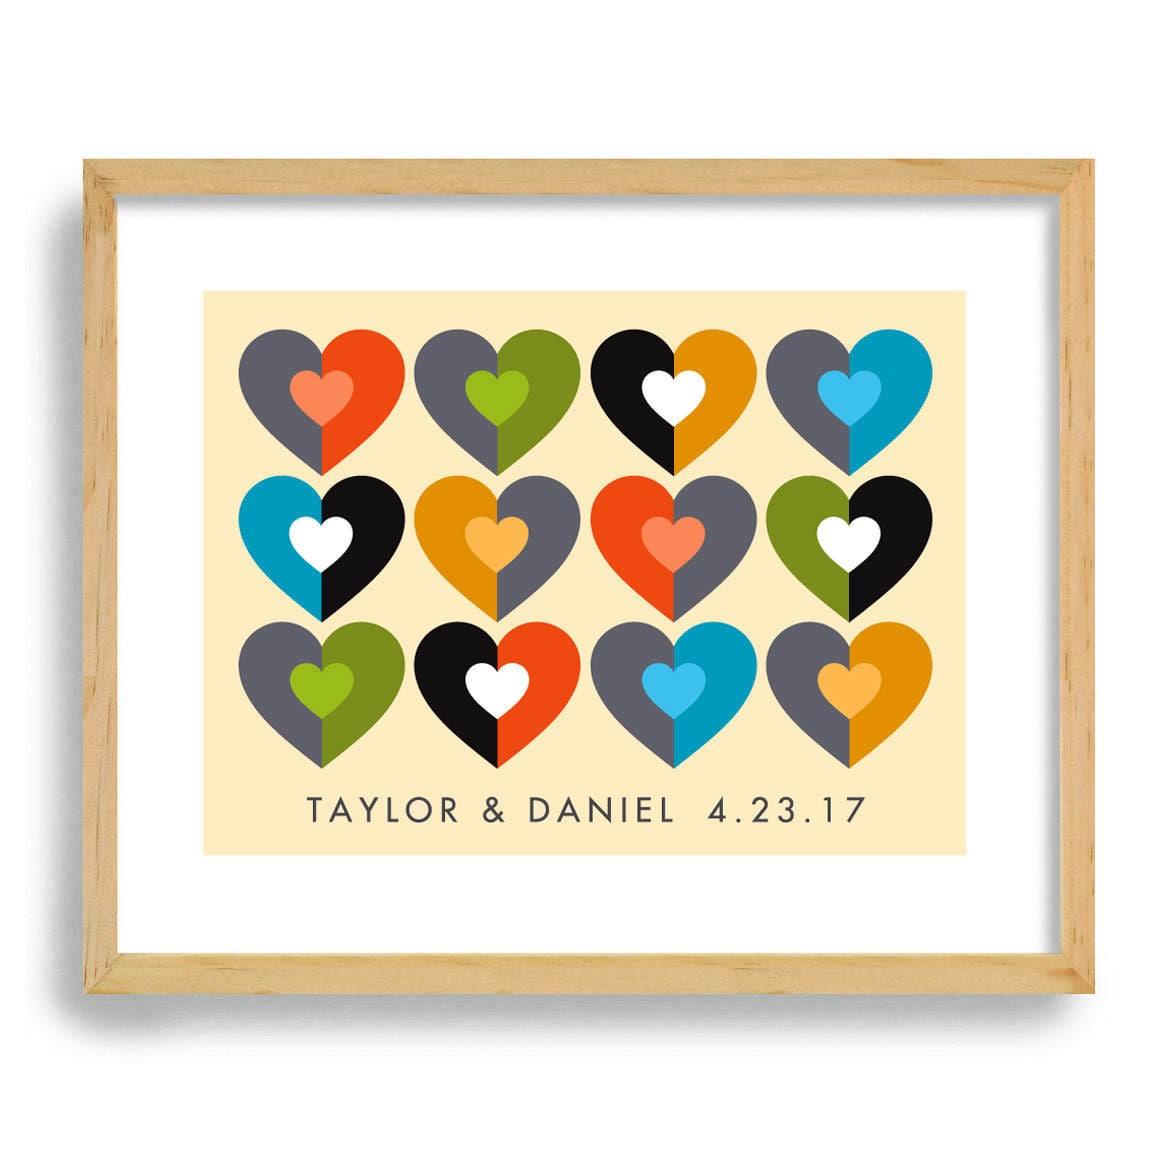 Mid Century Modern Wedding Gift Art Print 11x14 Heart Decor